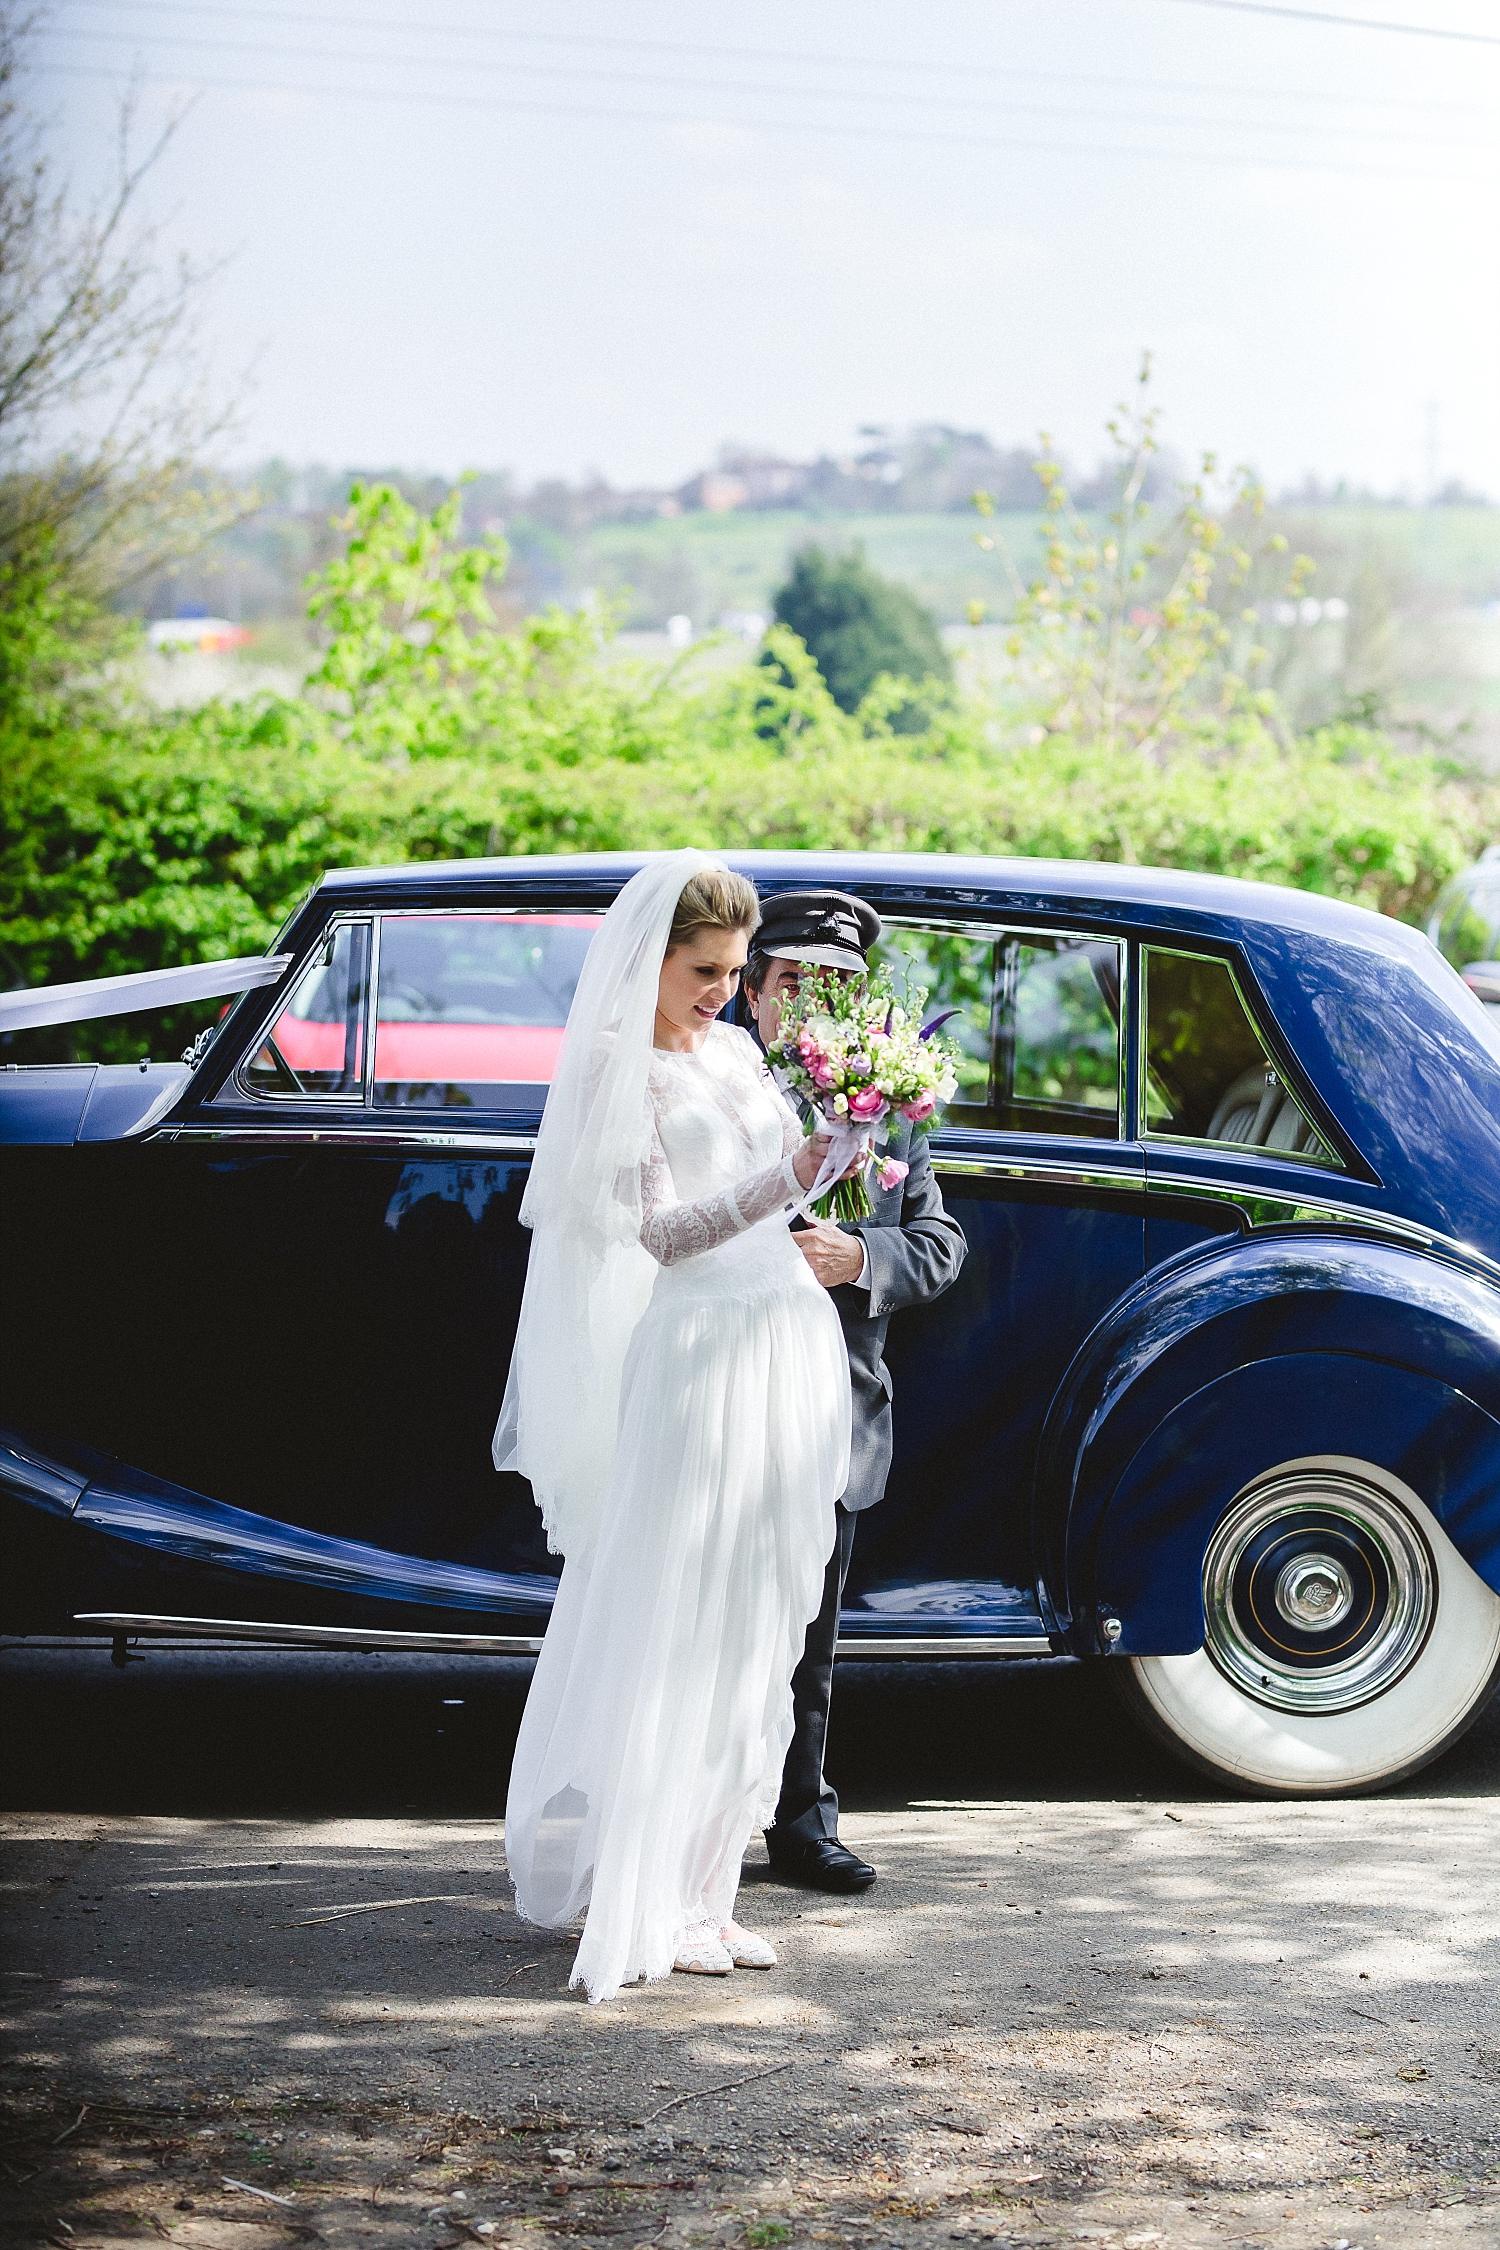 Gaynes-Park-Wedding-Photographer_0046.jpg